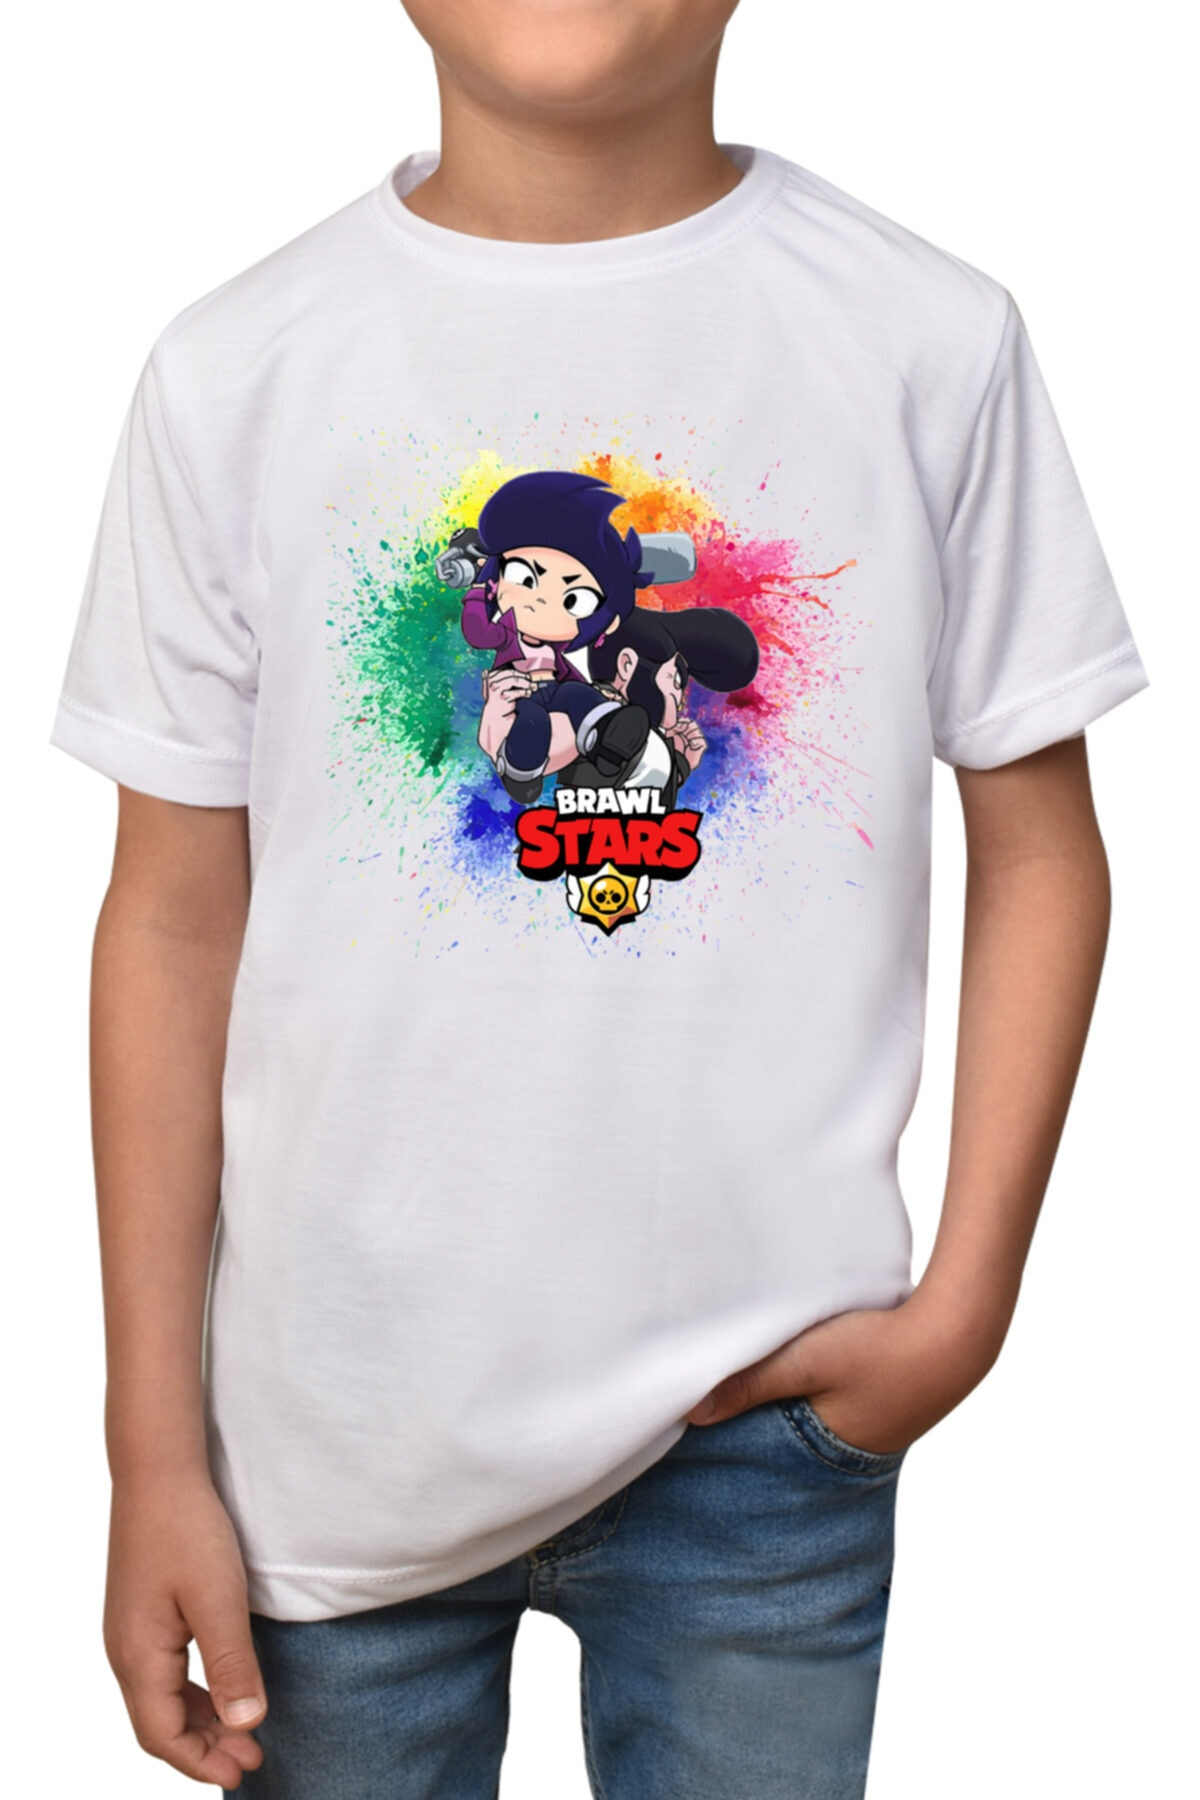 Brawl Stars - Beyaz Çocuk - Yetişkin Unisex T-shirt T-5